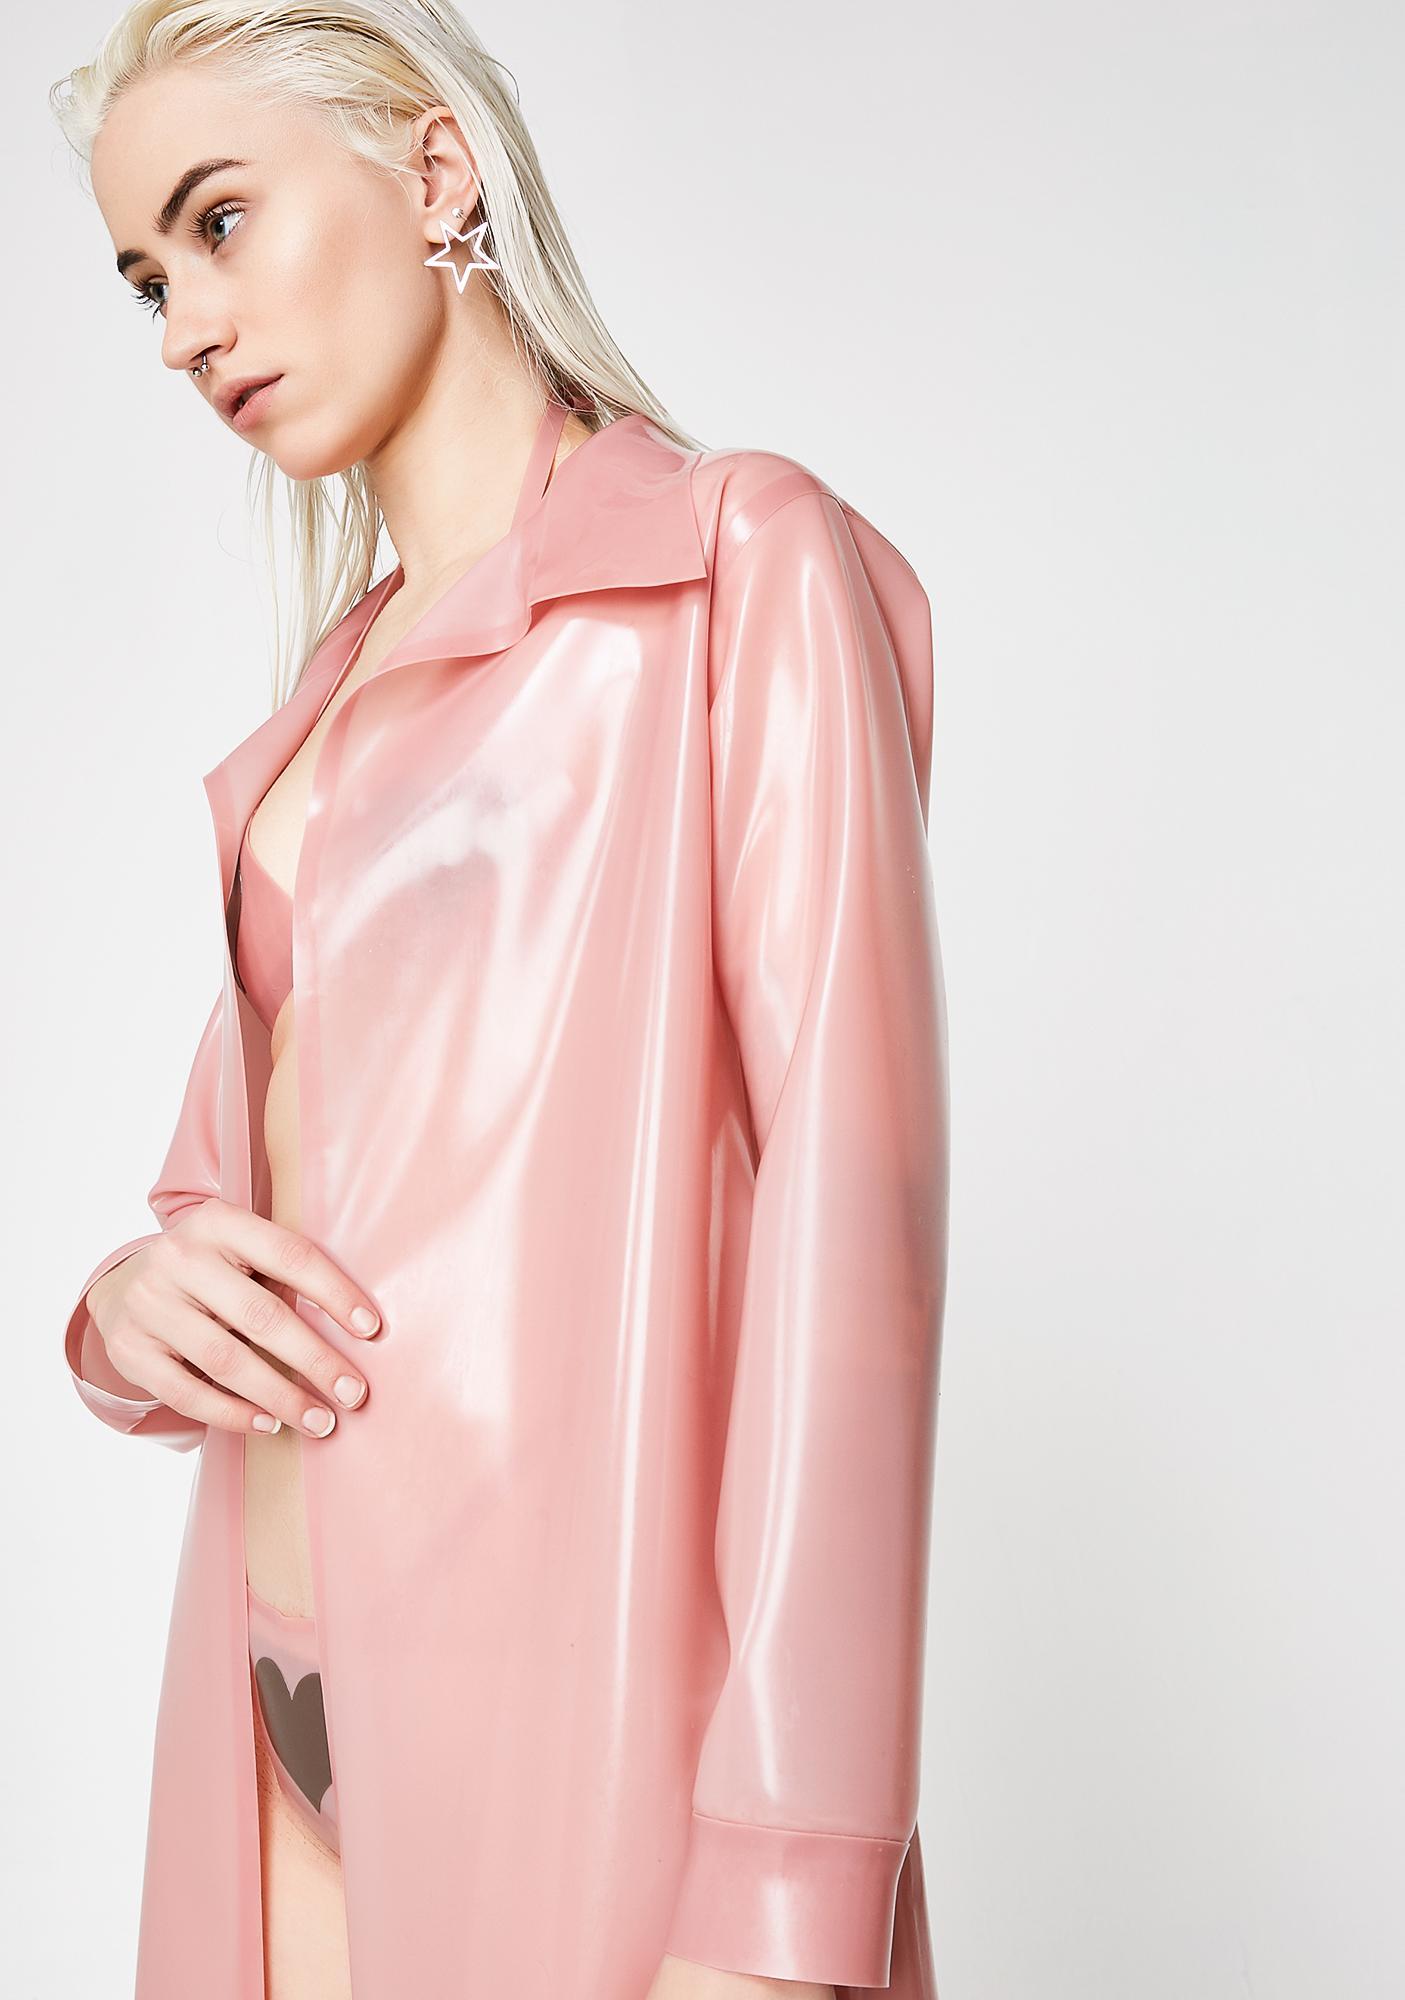 Meat Clothing Princess Coat